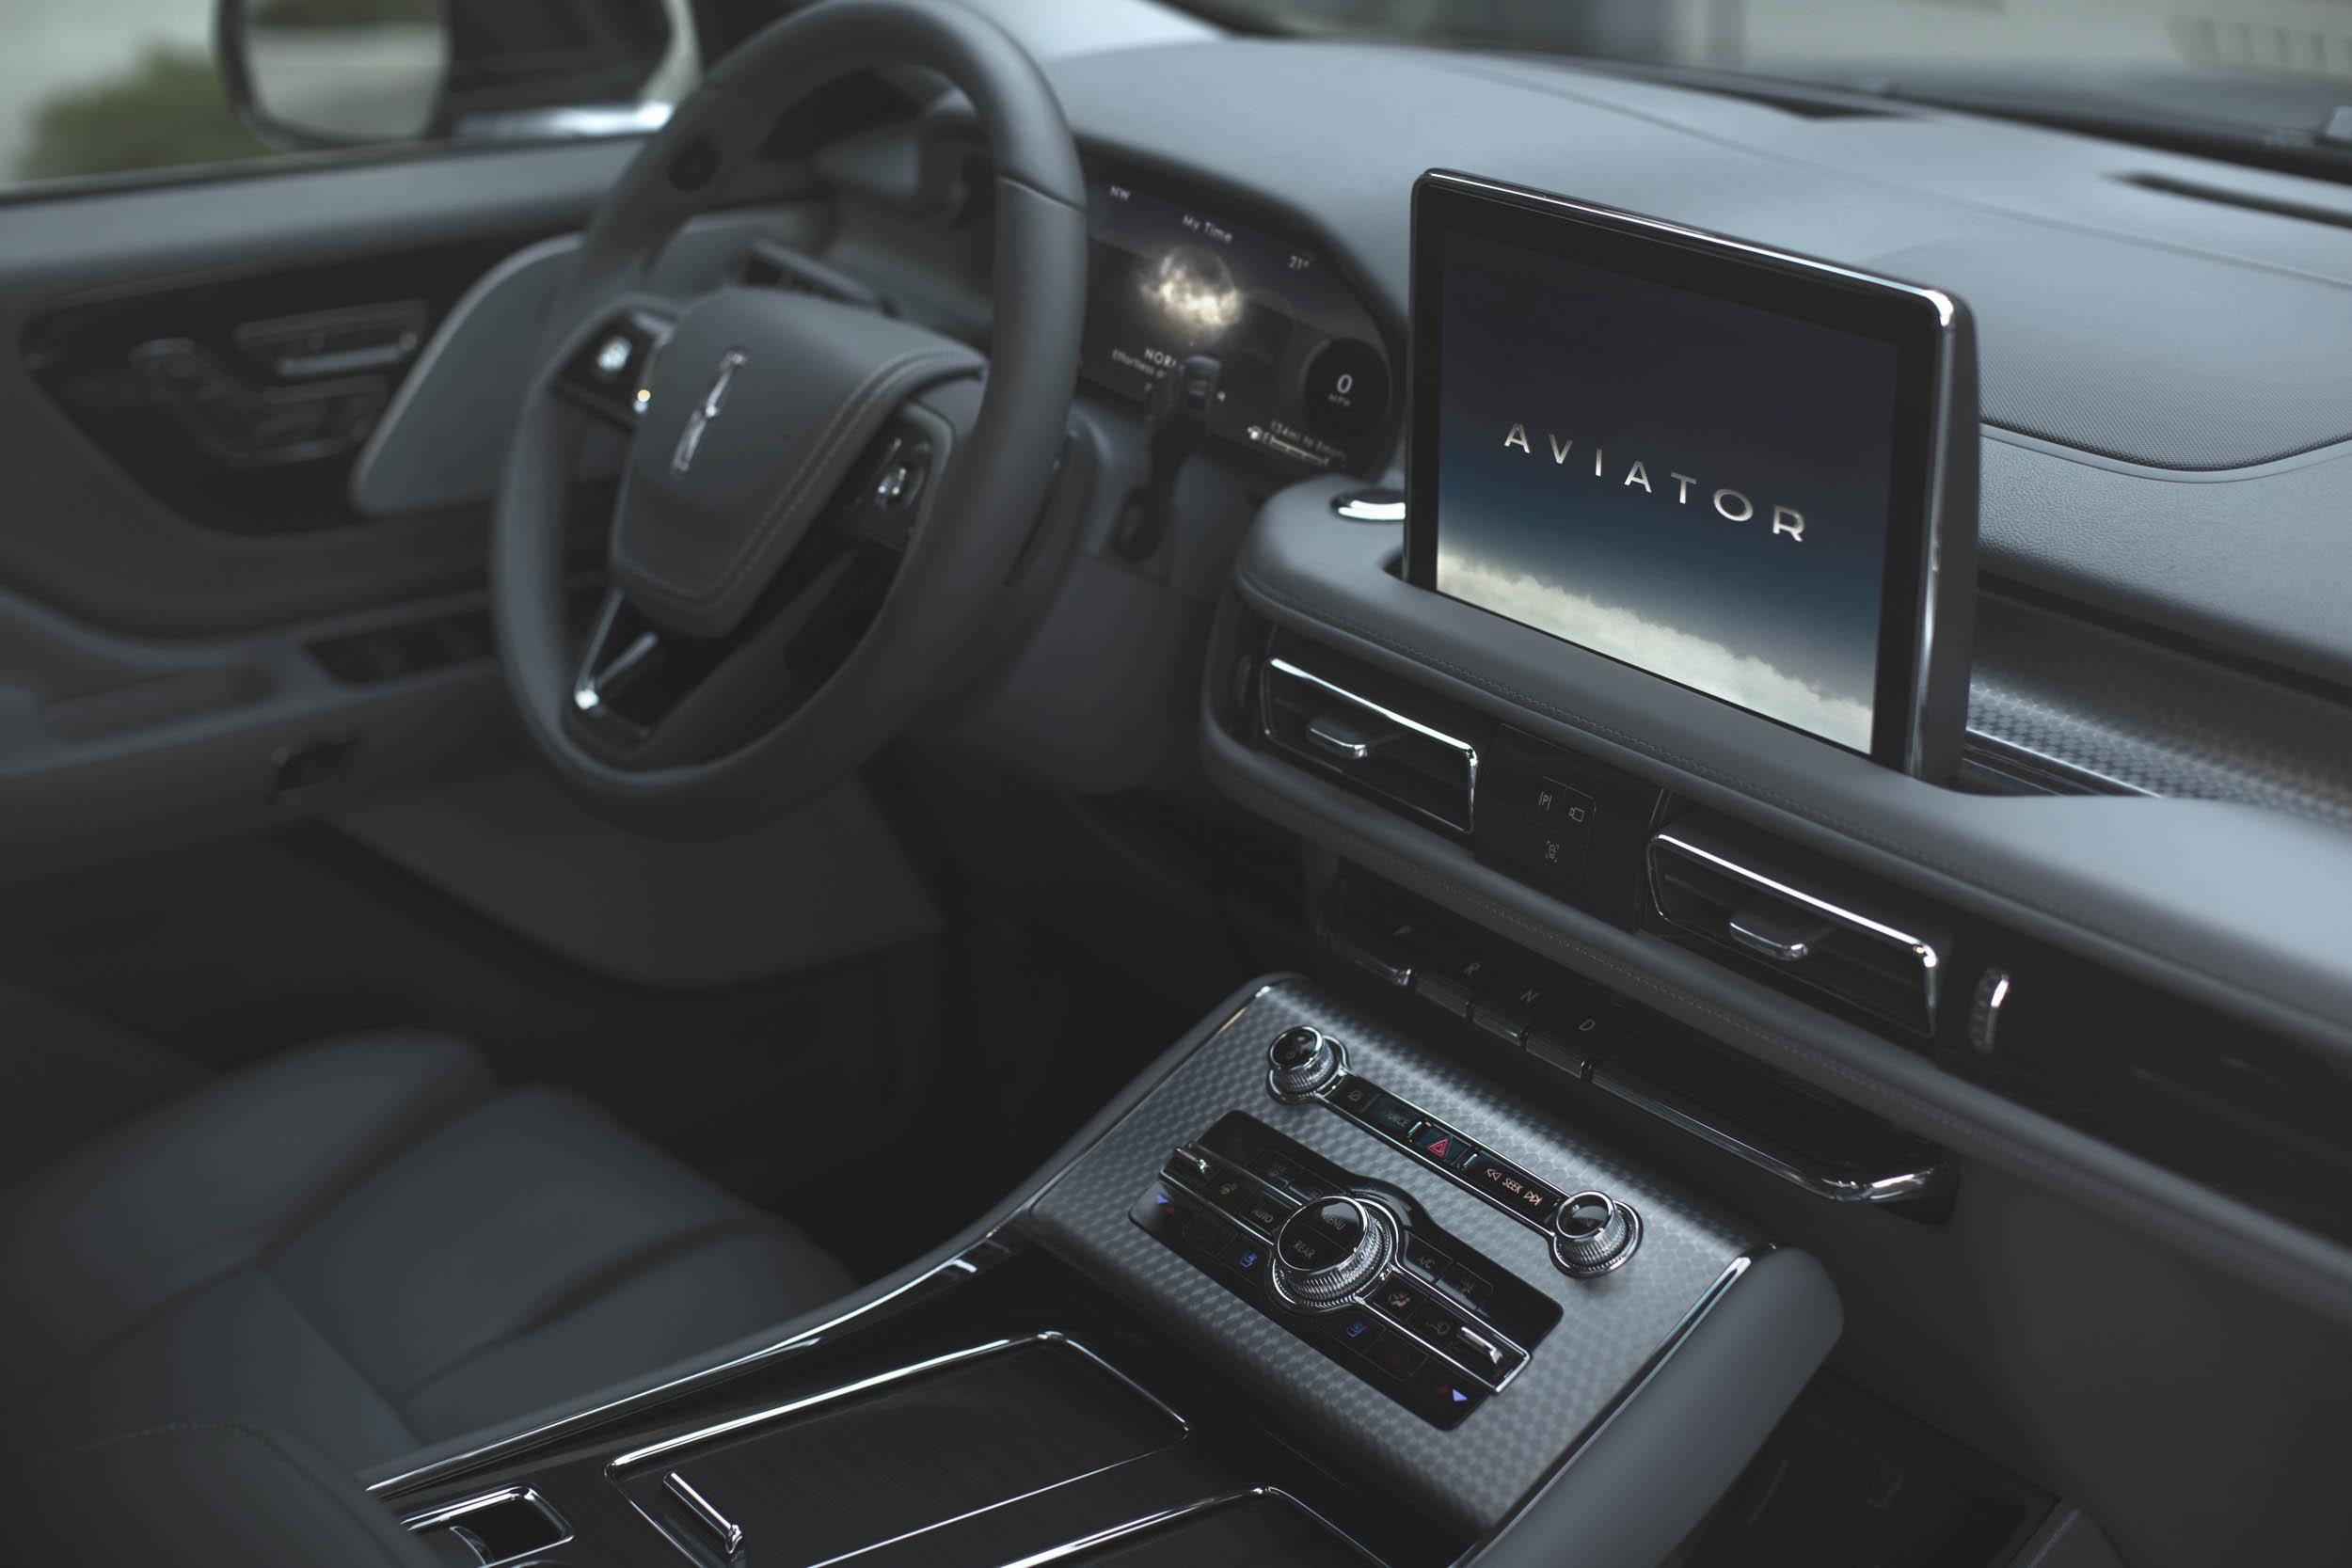 2020 Lincoln Aviator screen